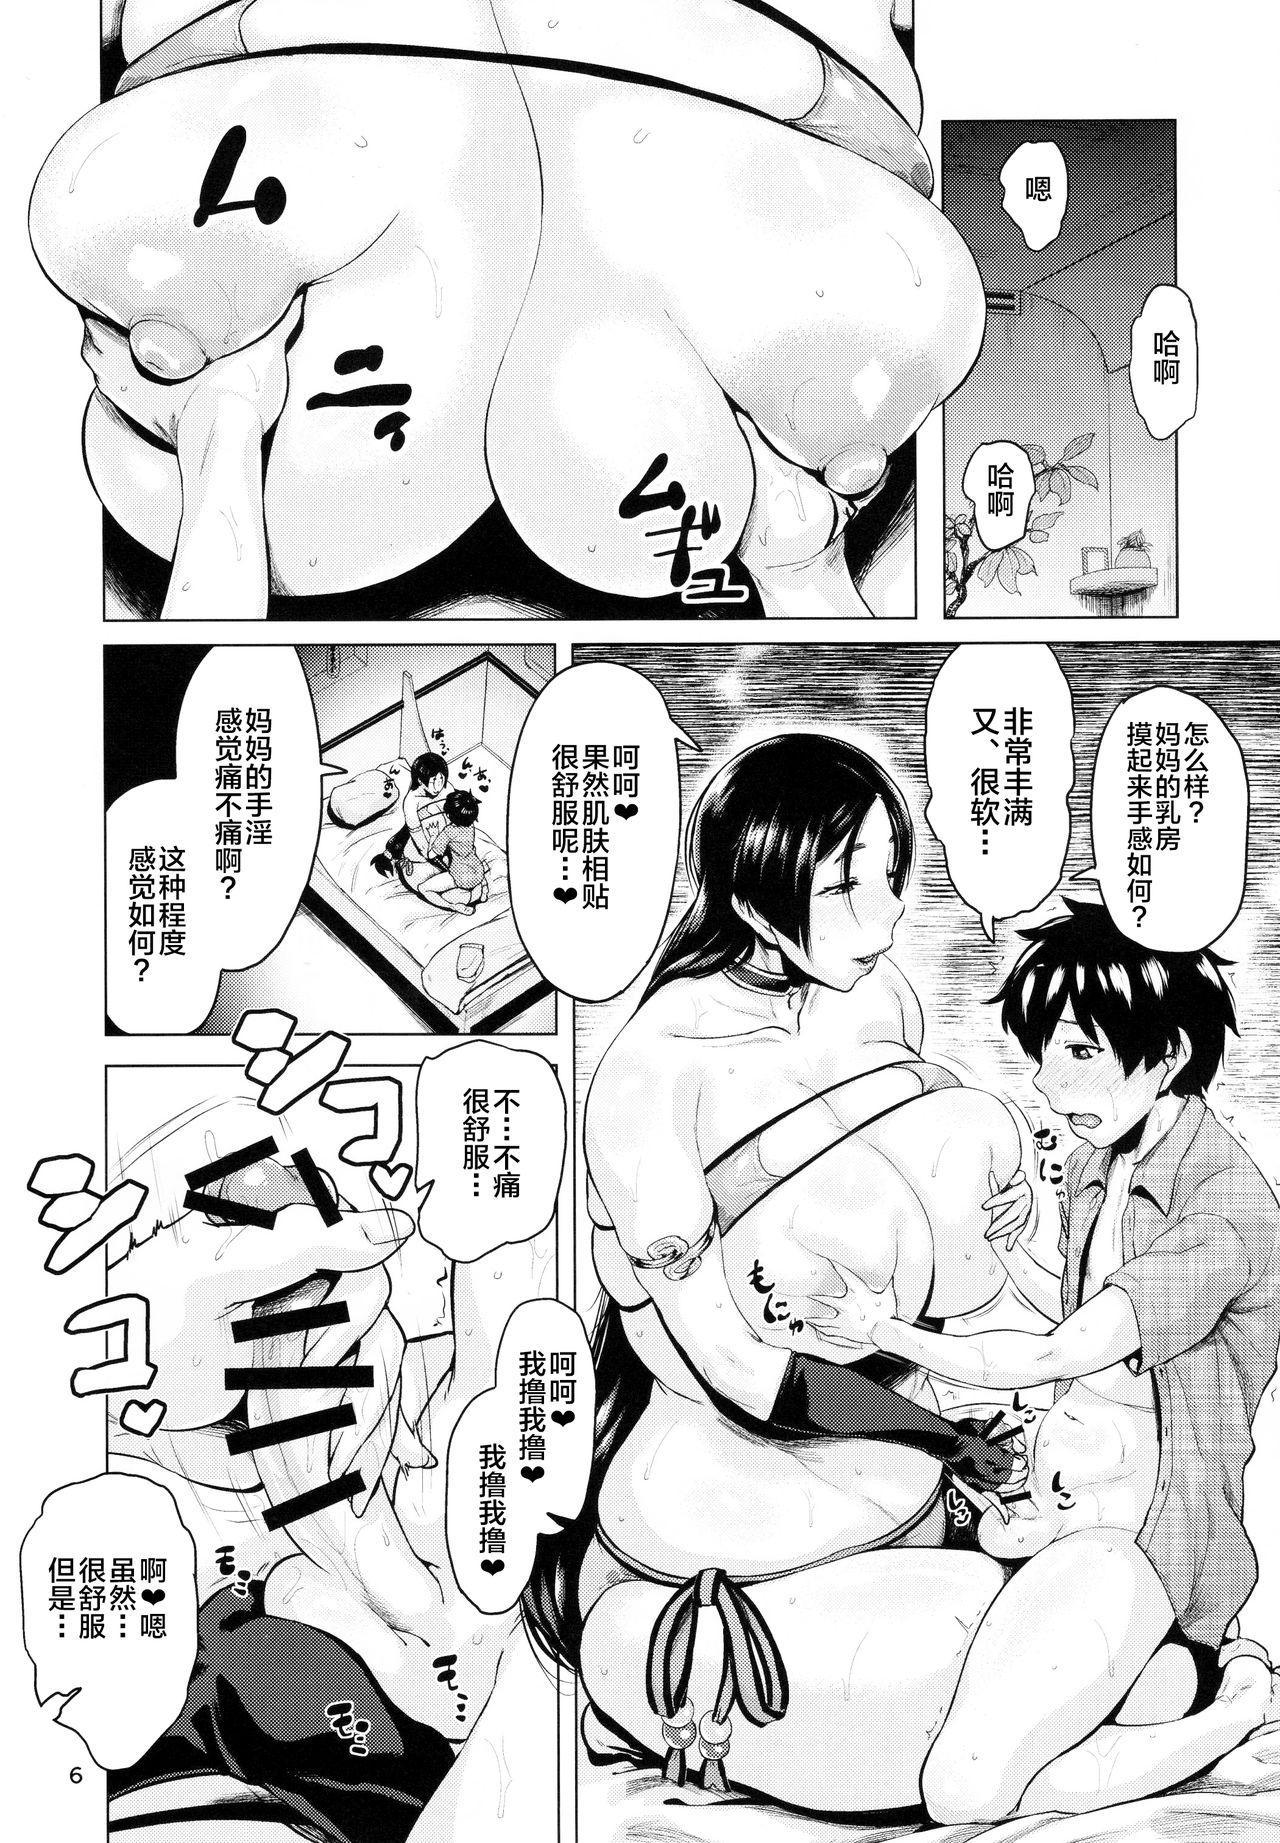 Natsu no Haha ni Goyoujin 7